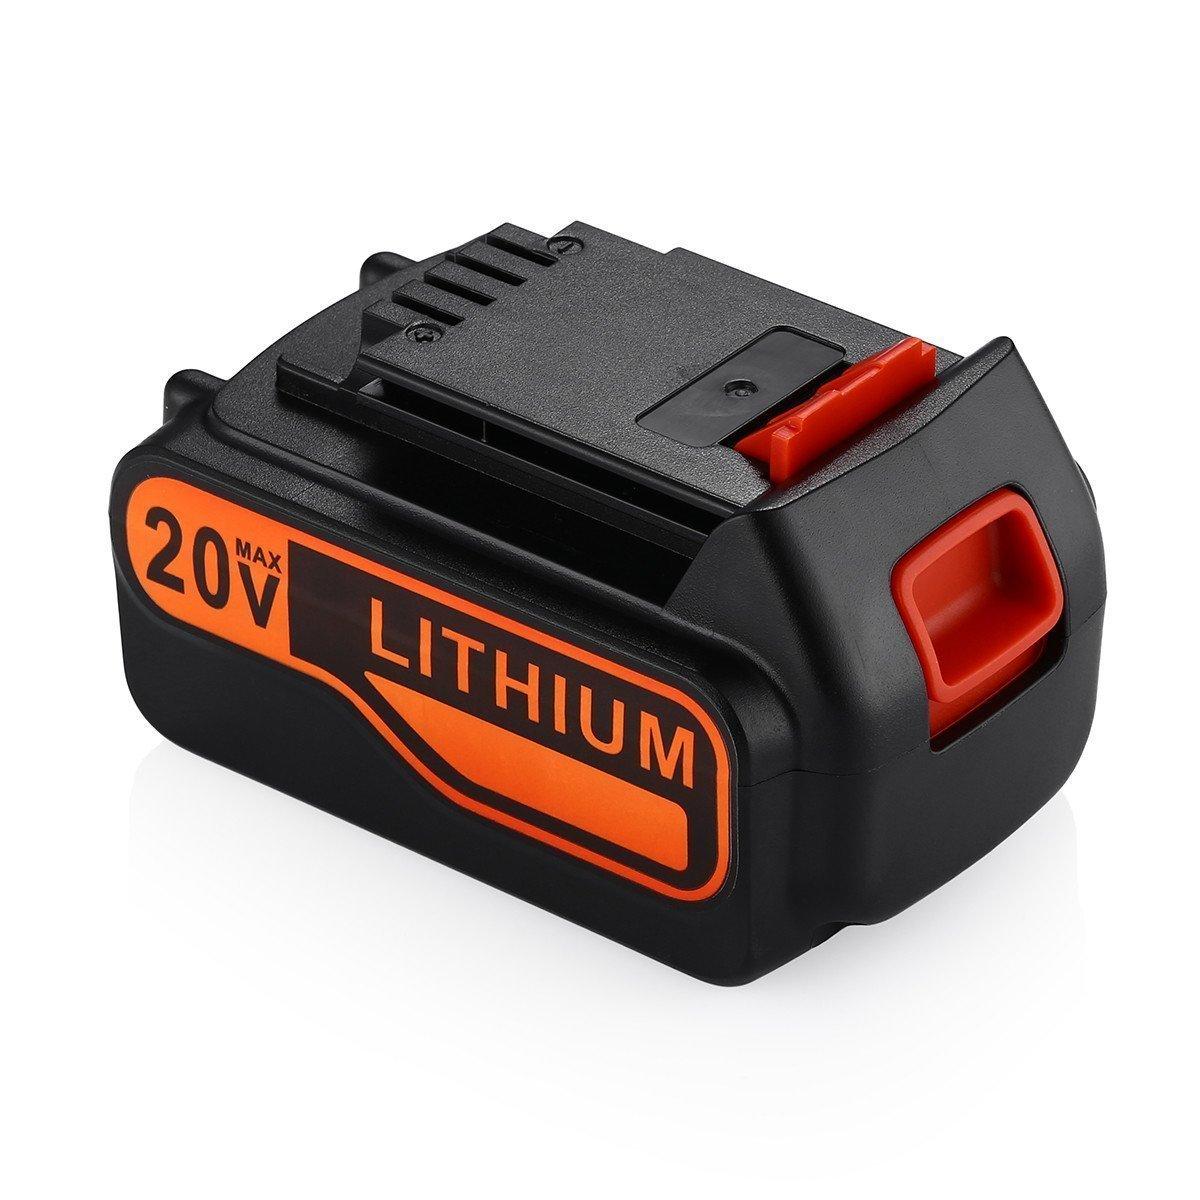 Powerextra 5.0Ah 20V MAX Replacement Battery for Black&Decker LBXR20 LBXR20-OPE LB20 LBX20 LBX4020 LB2X4020-OPE Black and Decker Lithium